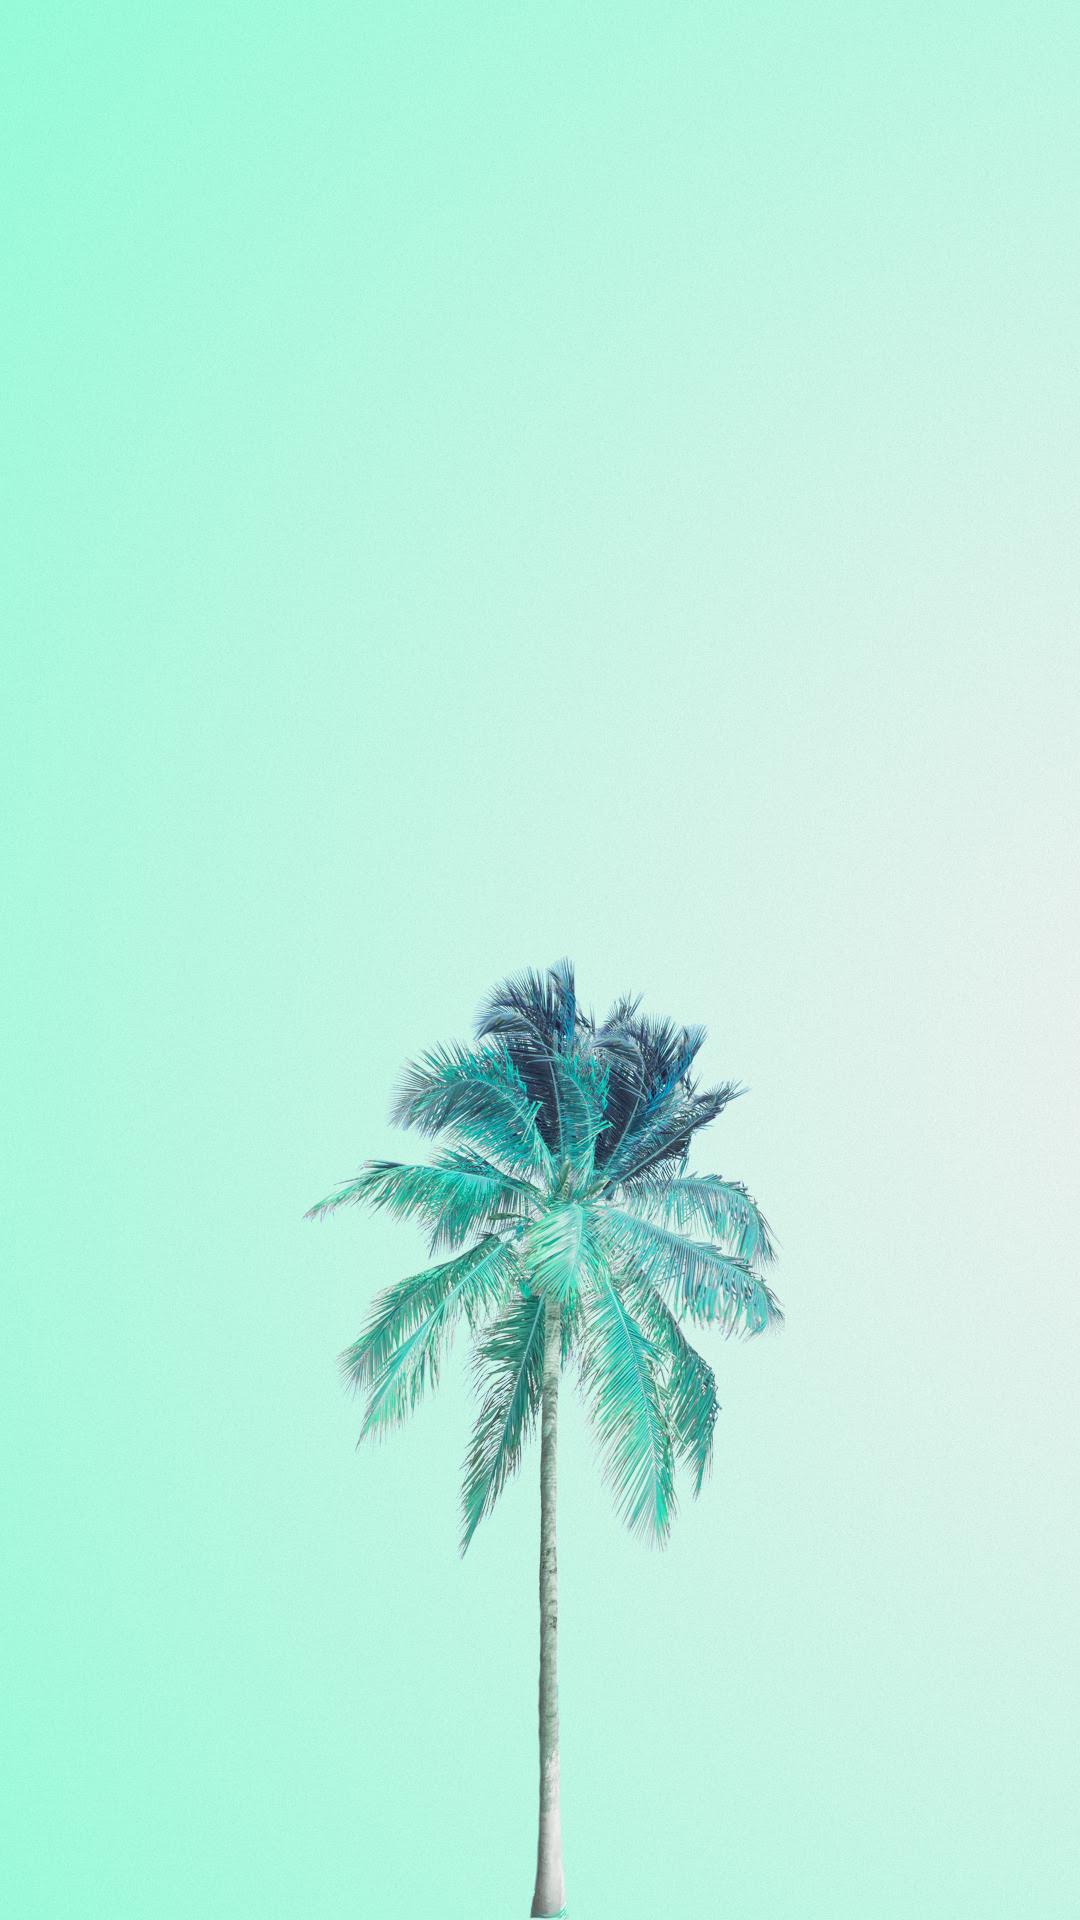 Unduh 850 Koleksi Background Tumblr Hijau HD Gratis